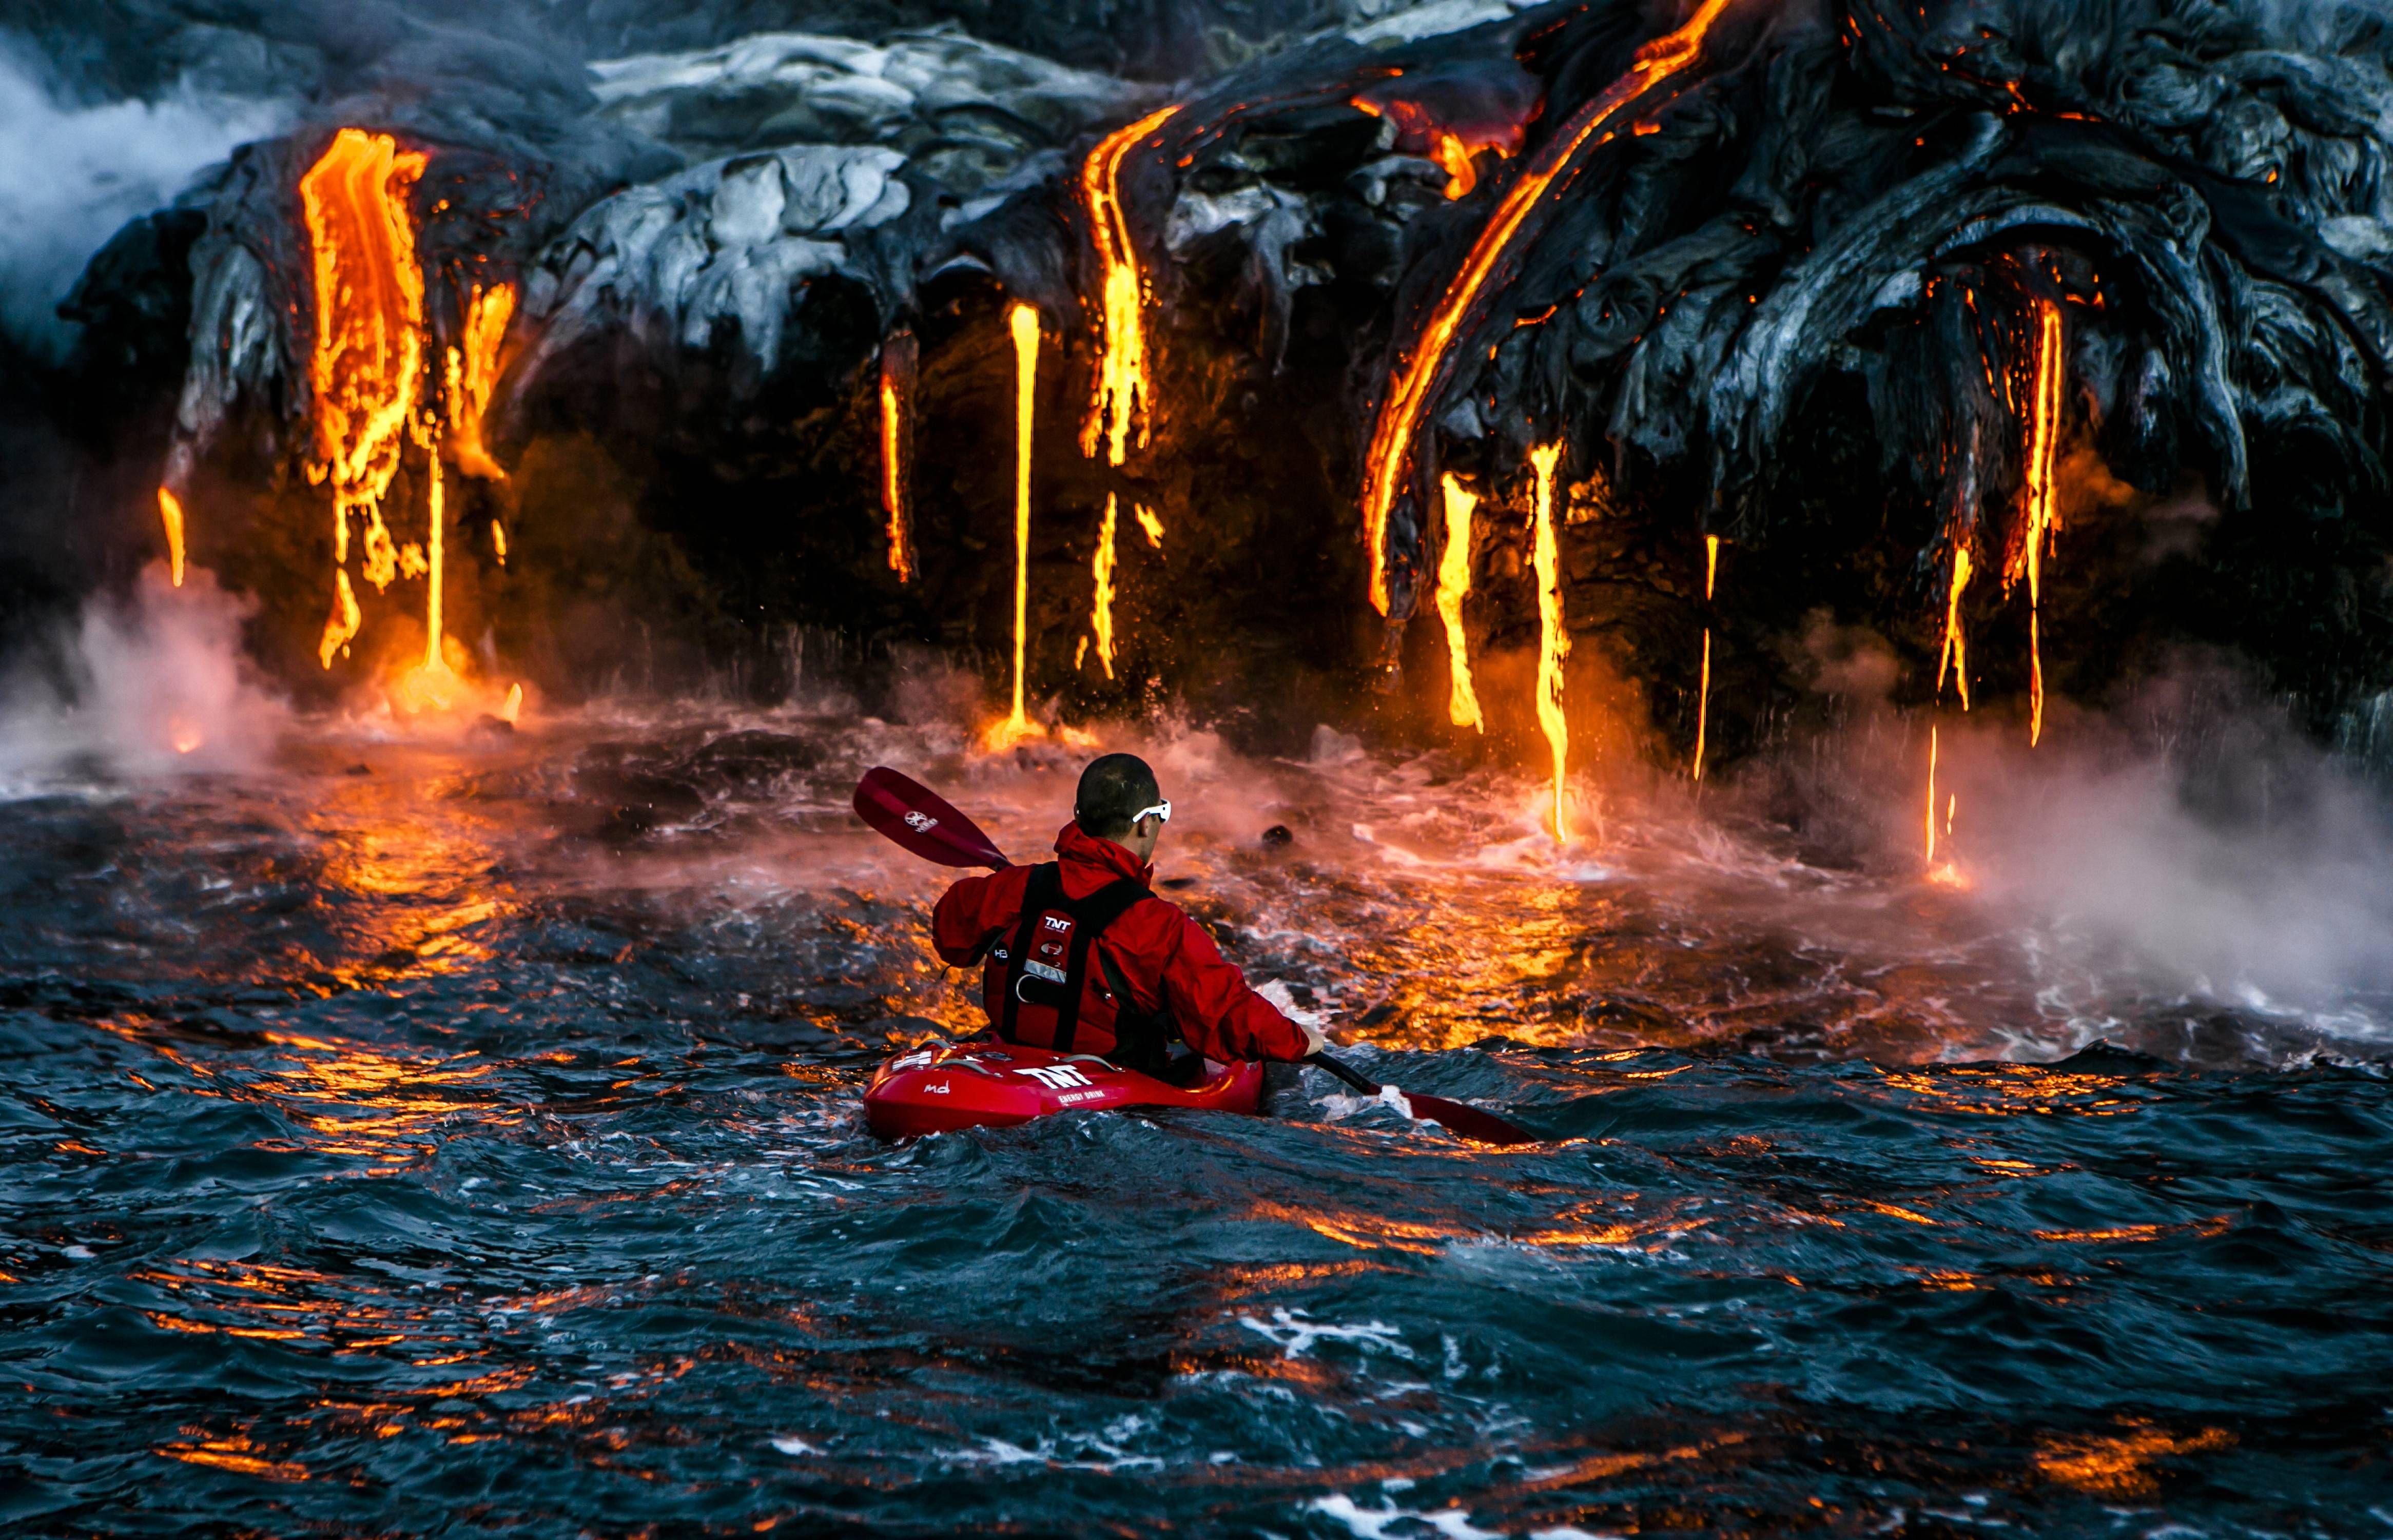 Kayakingg Lava Extreme Kayaking National Geographic Photo